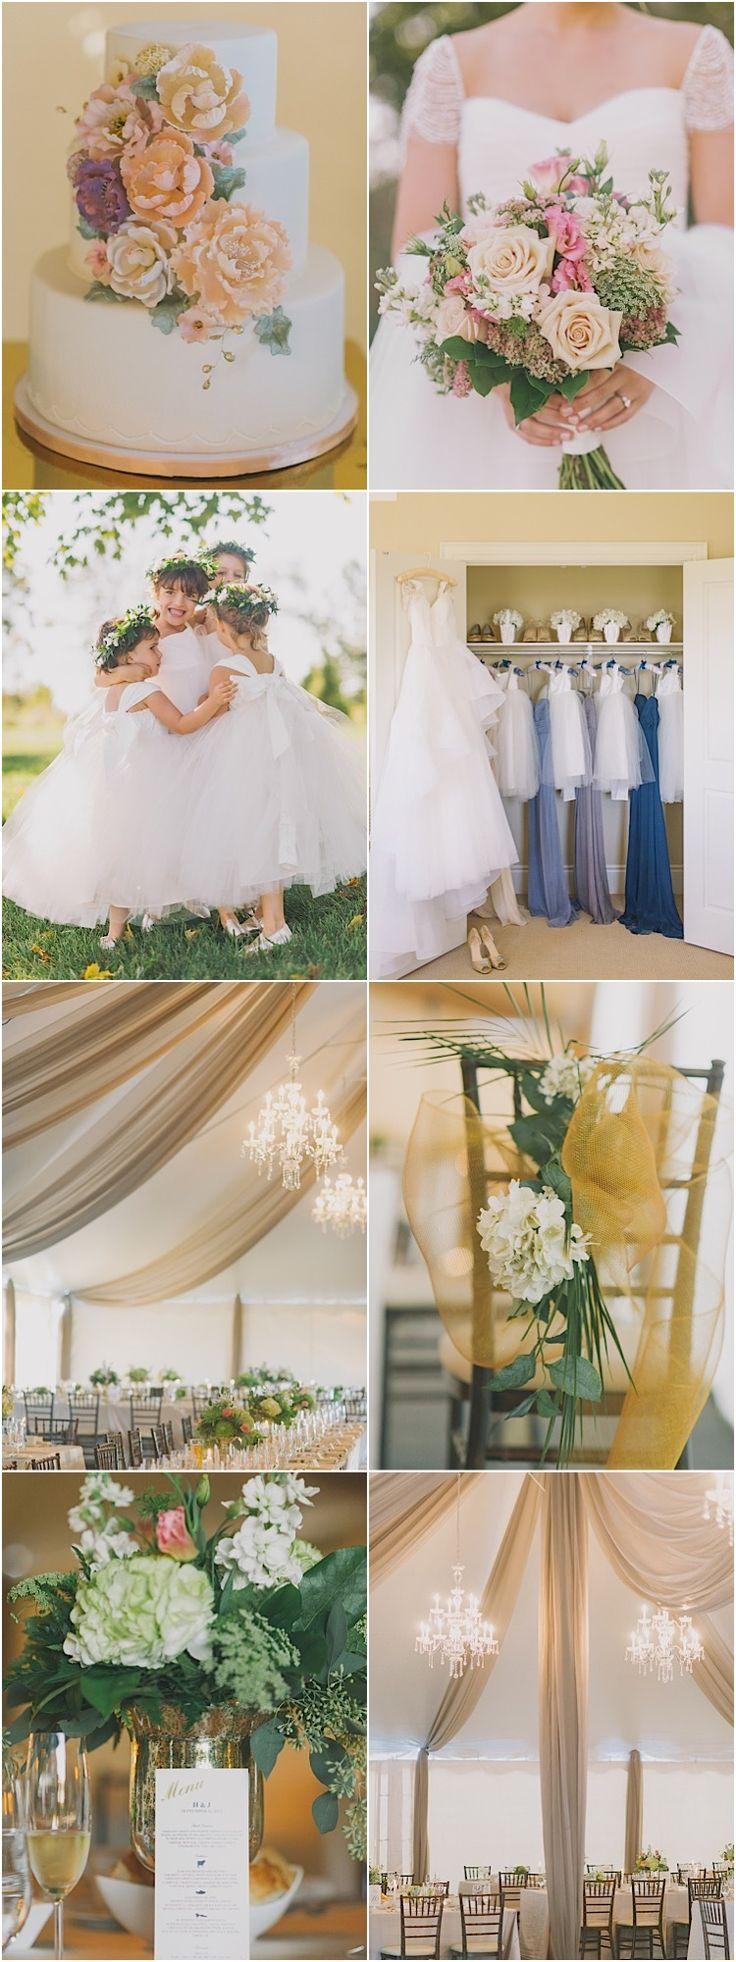 Elegant formal wedding reception idea; photo: Tara McMullen Photography